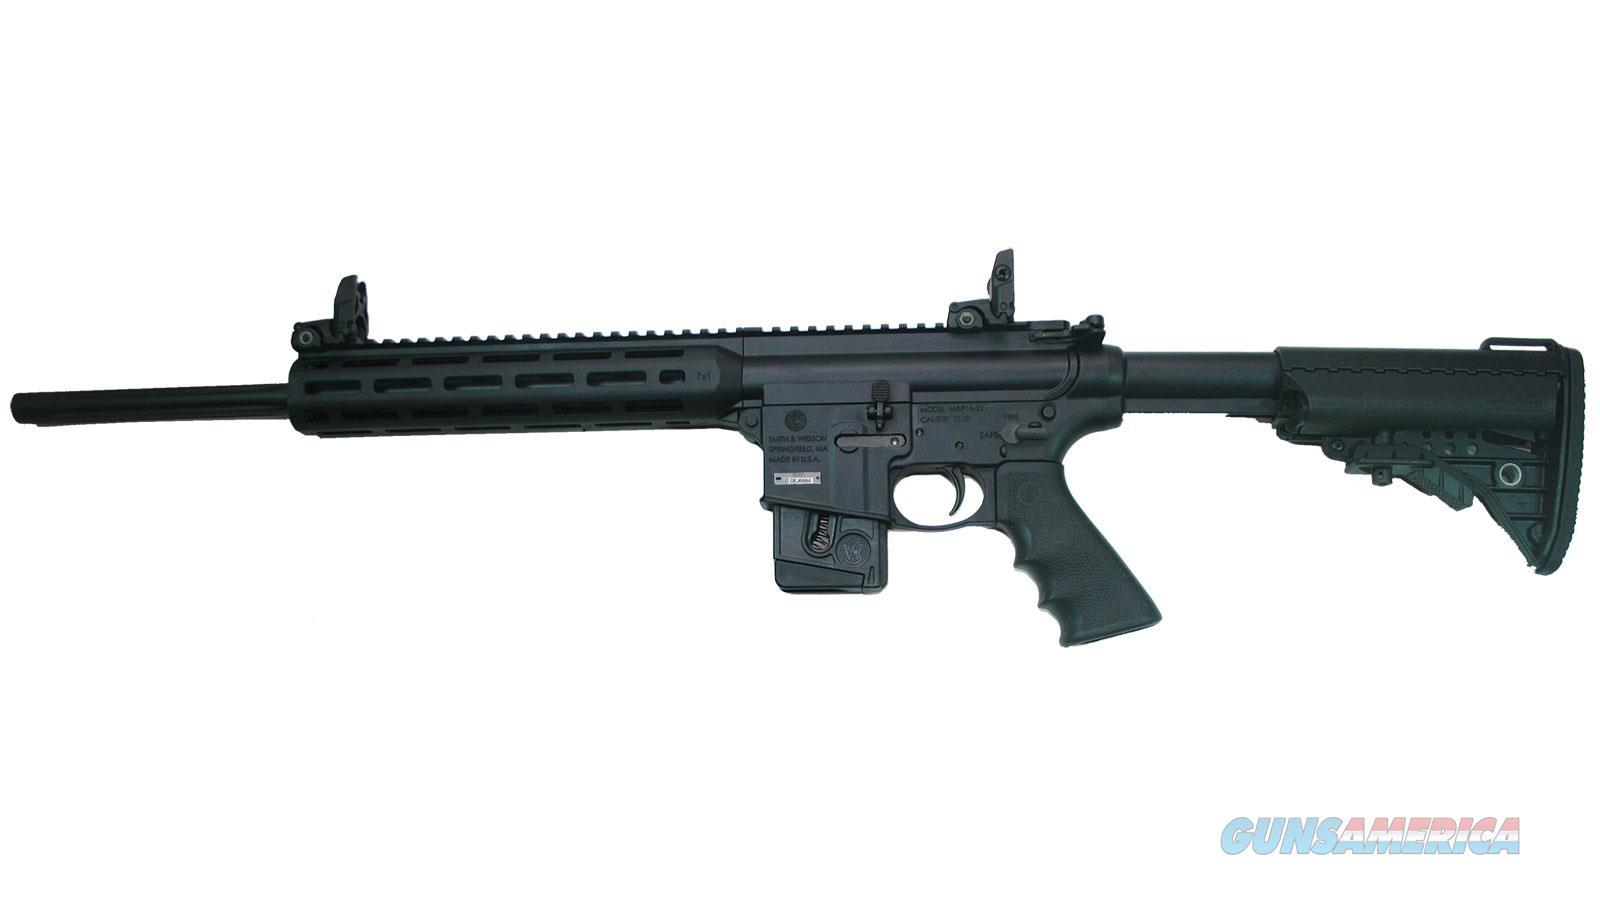 "Smith & Wesson M&P 15-22 Performance Center Sport Semi Auto Rifle 22Lr 18"" 10Rnd Black Fixed Stk Compliant 11507  Guns > Rifles > S Misc Rifles"